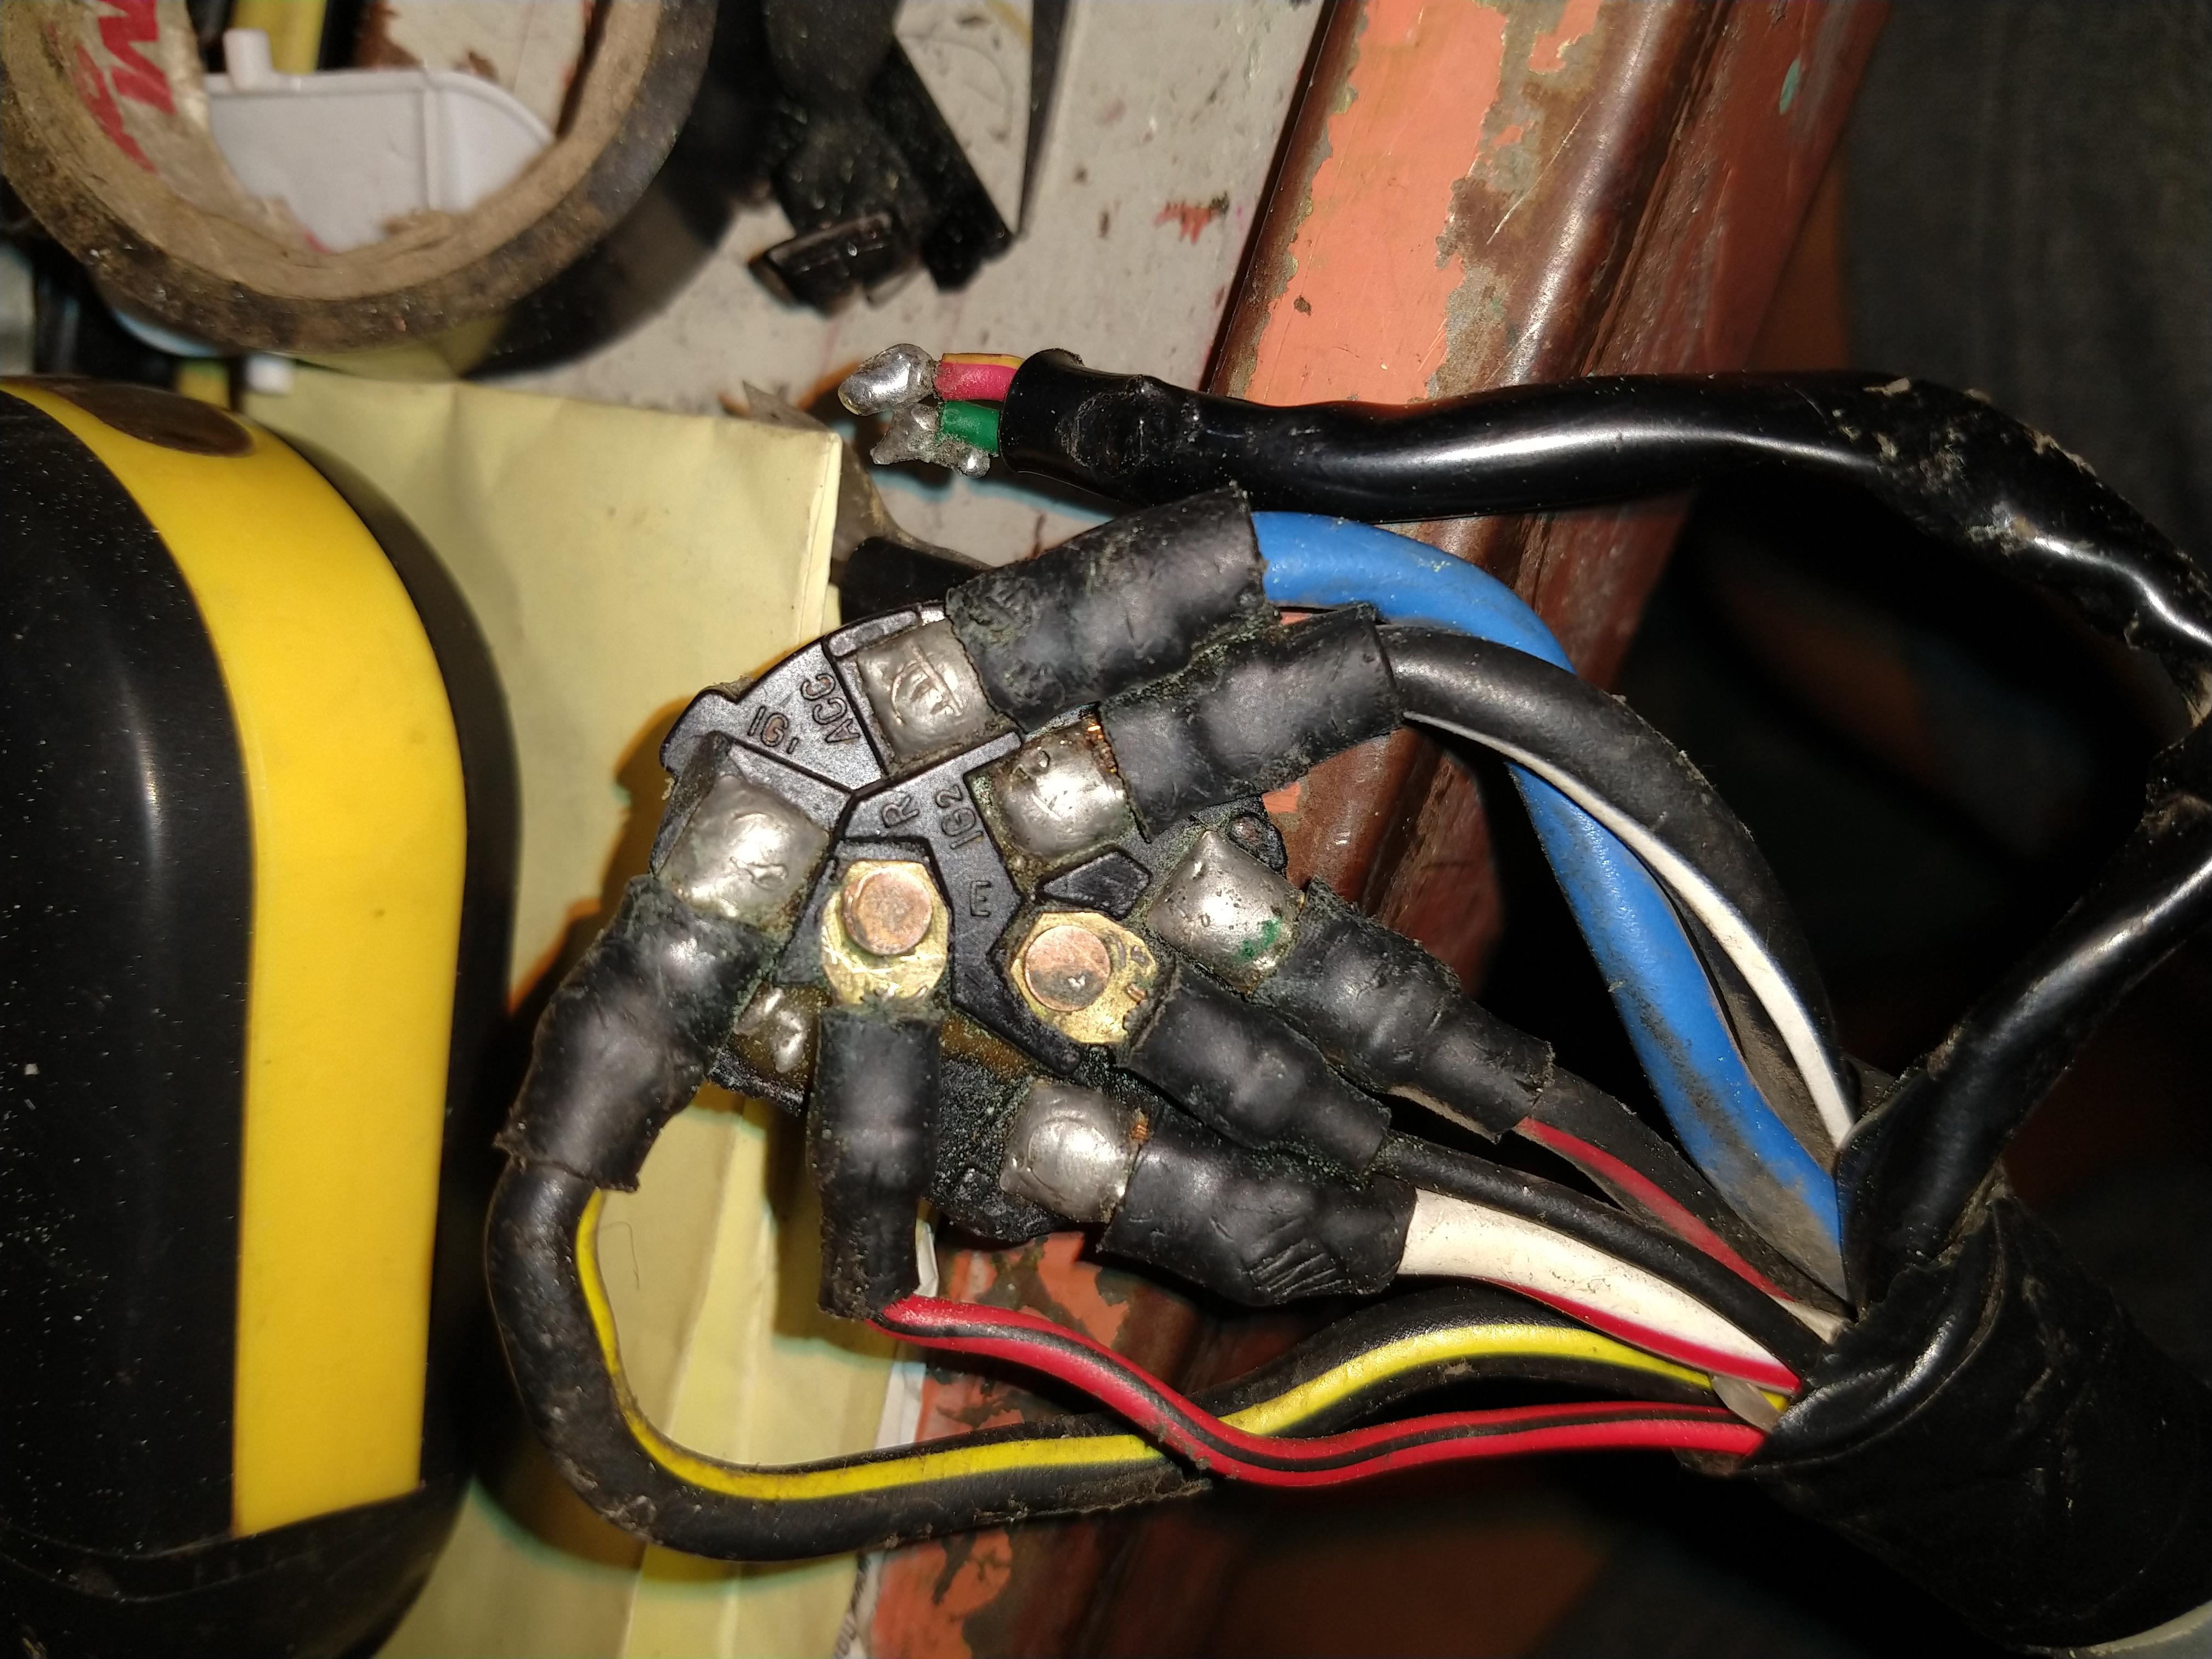 89 Mazda B2200 Ignition Diagram Wiring Diagrams Panel Panel Chatteriedelavalleedufelin Fr